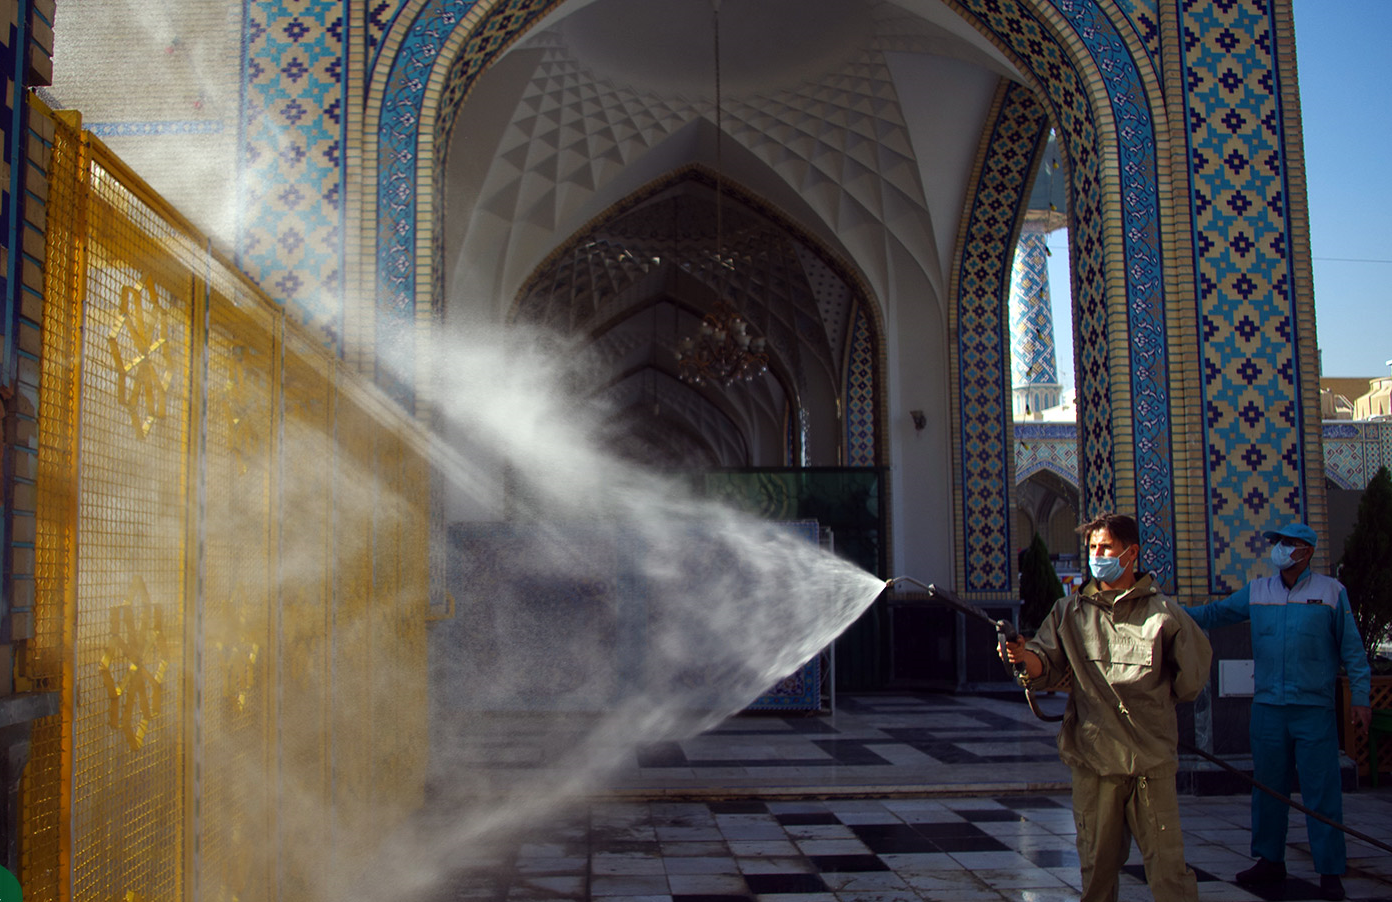 13990819000165 Test NewPhotoFree - تمهیدات شدید بهداشتی در حرم امام رضا (ع)+عکس